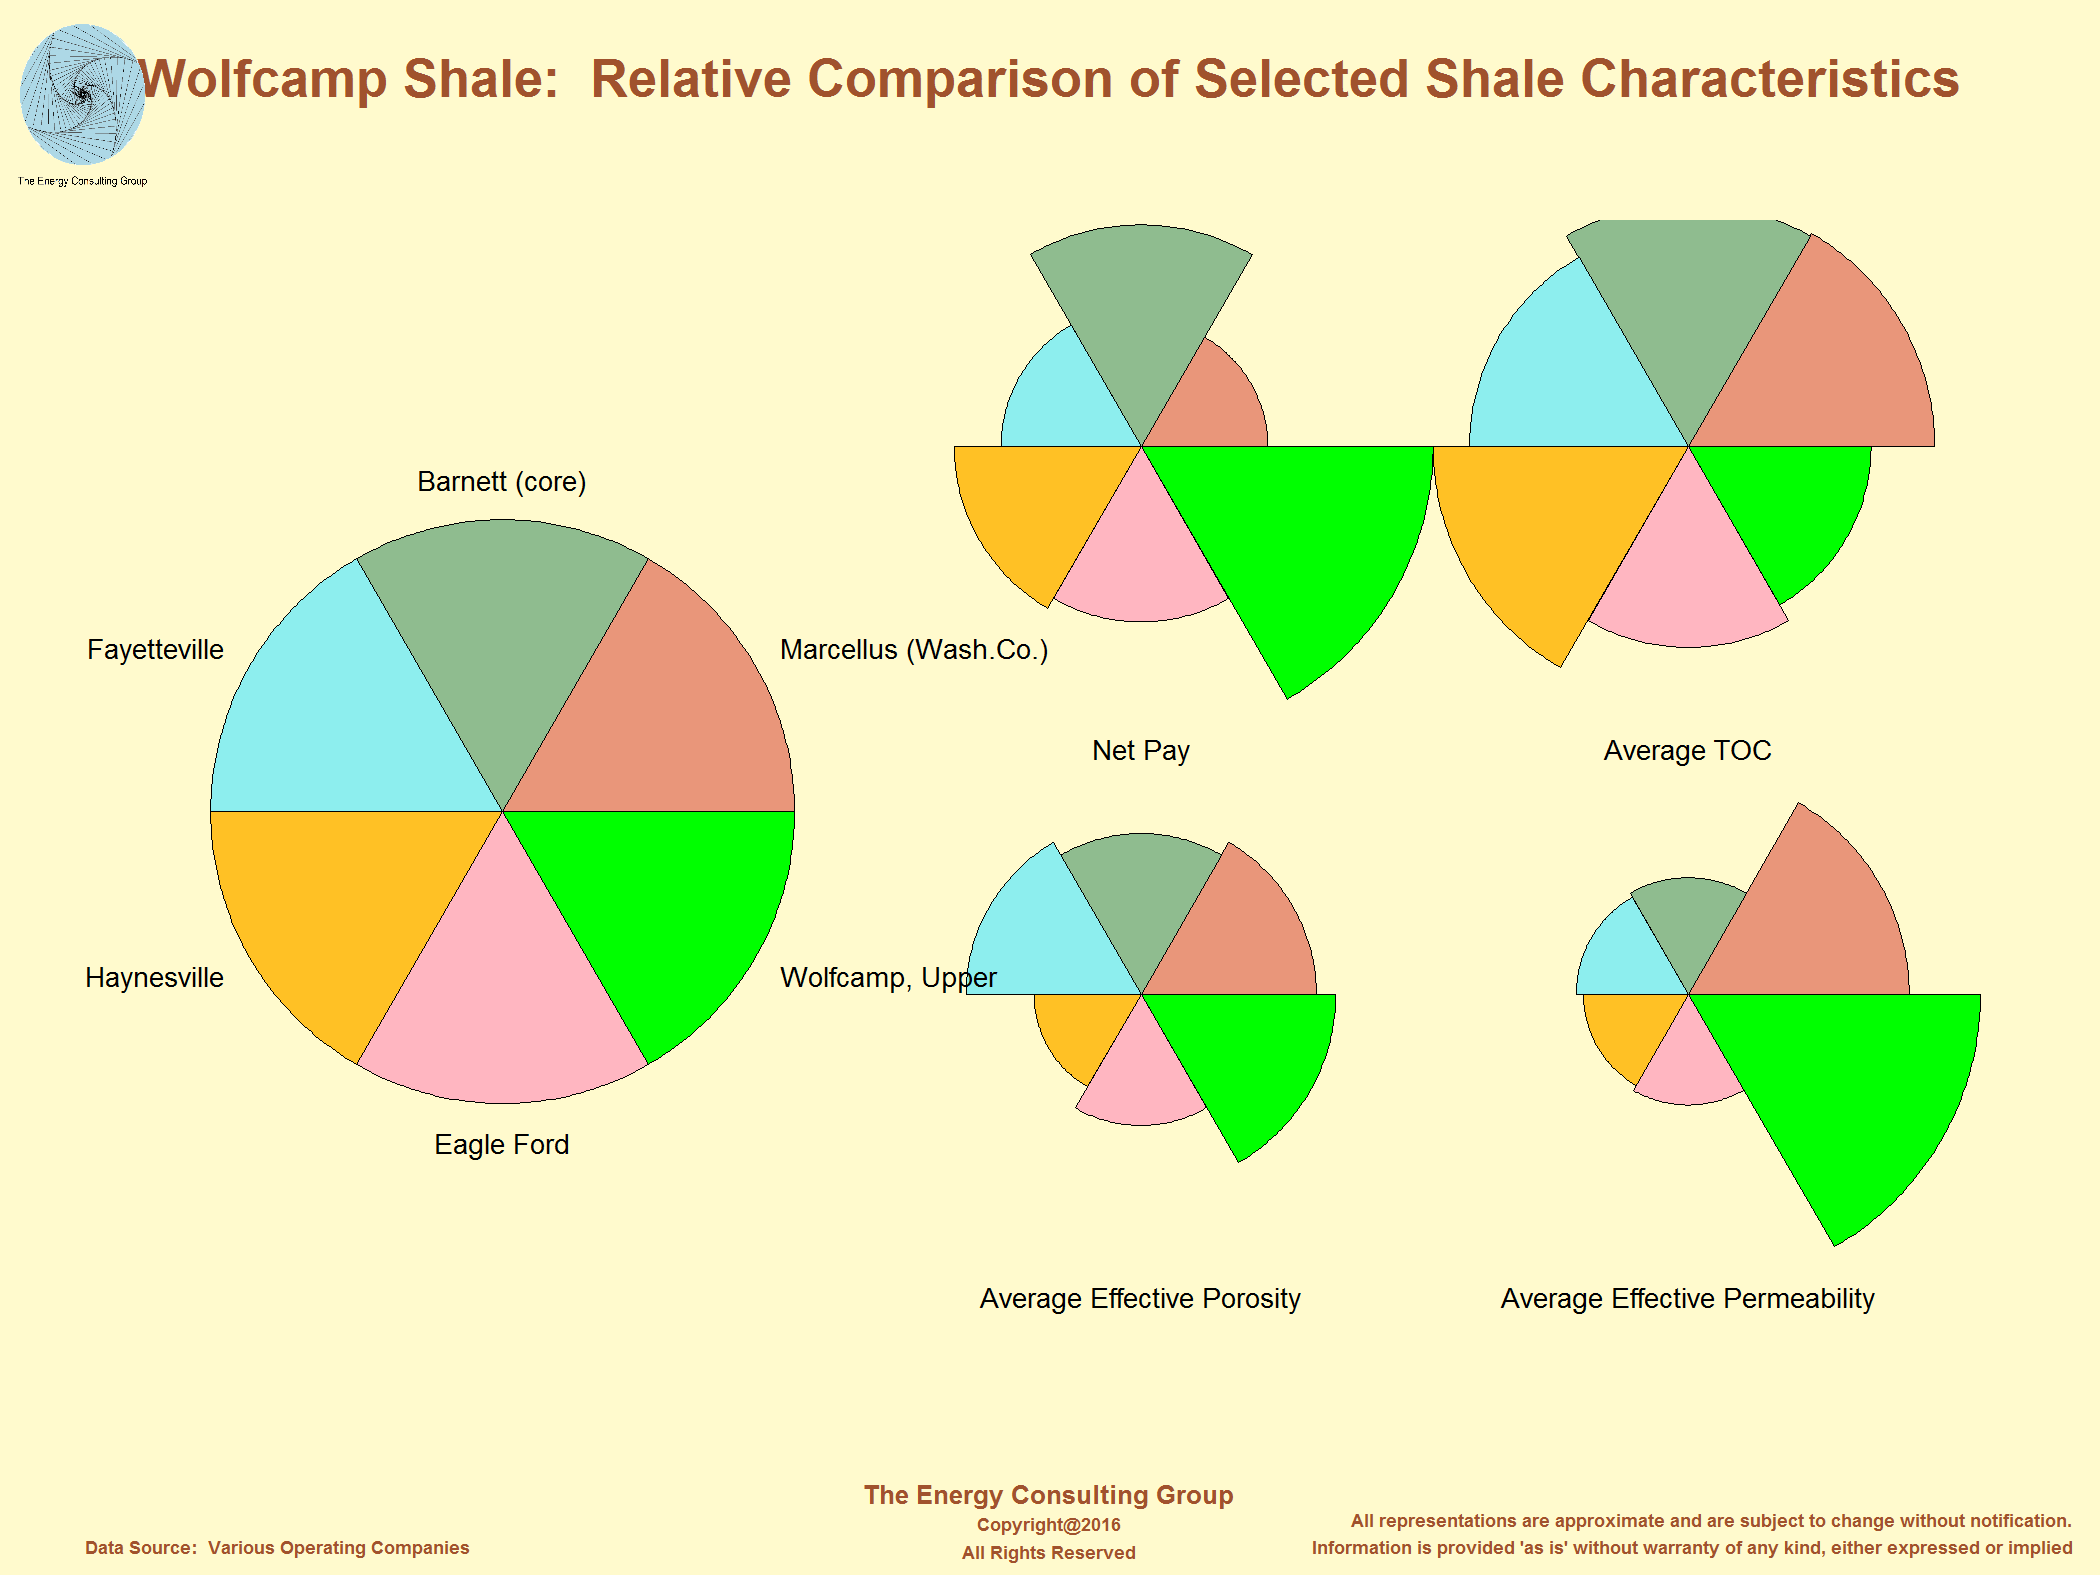 Shale Characteristic Comparison